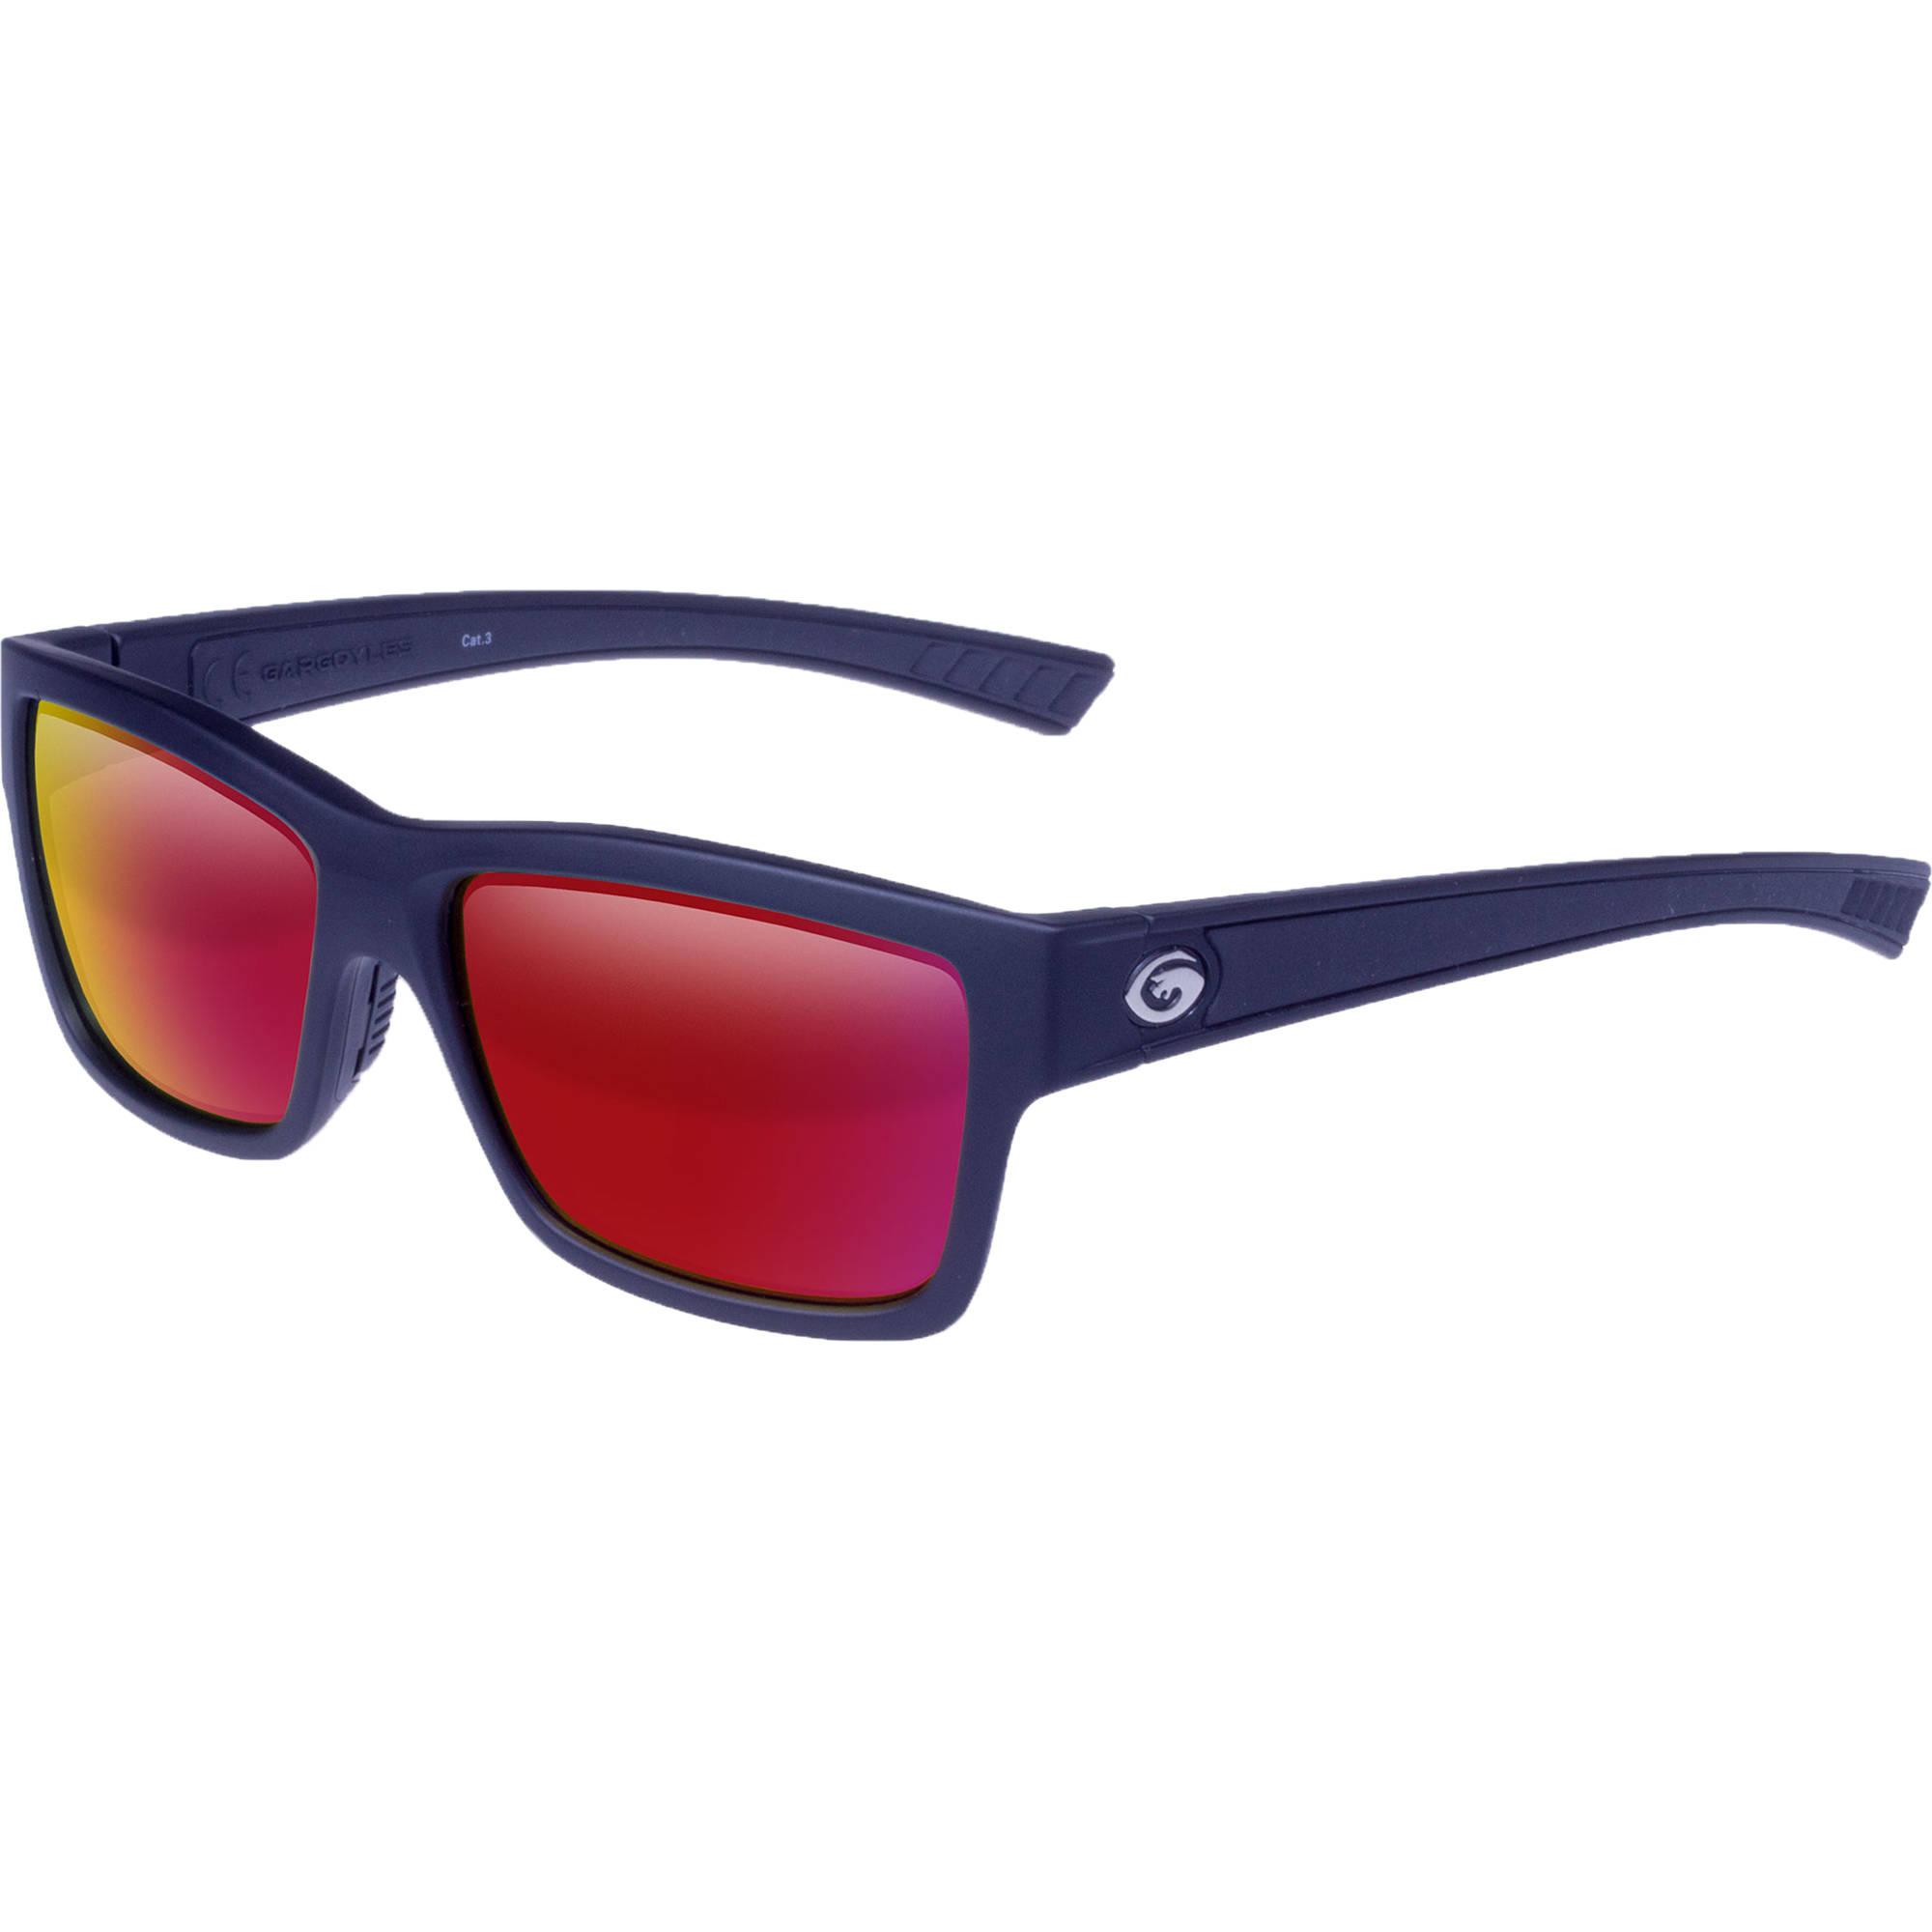 d5690d5963 Gargoyles Homeland Polarized Sunglasses 10700149.QTM B H Photo